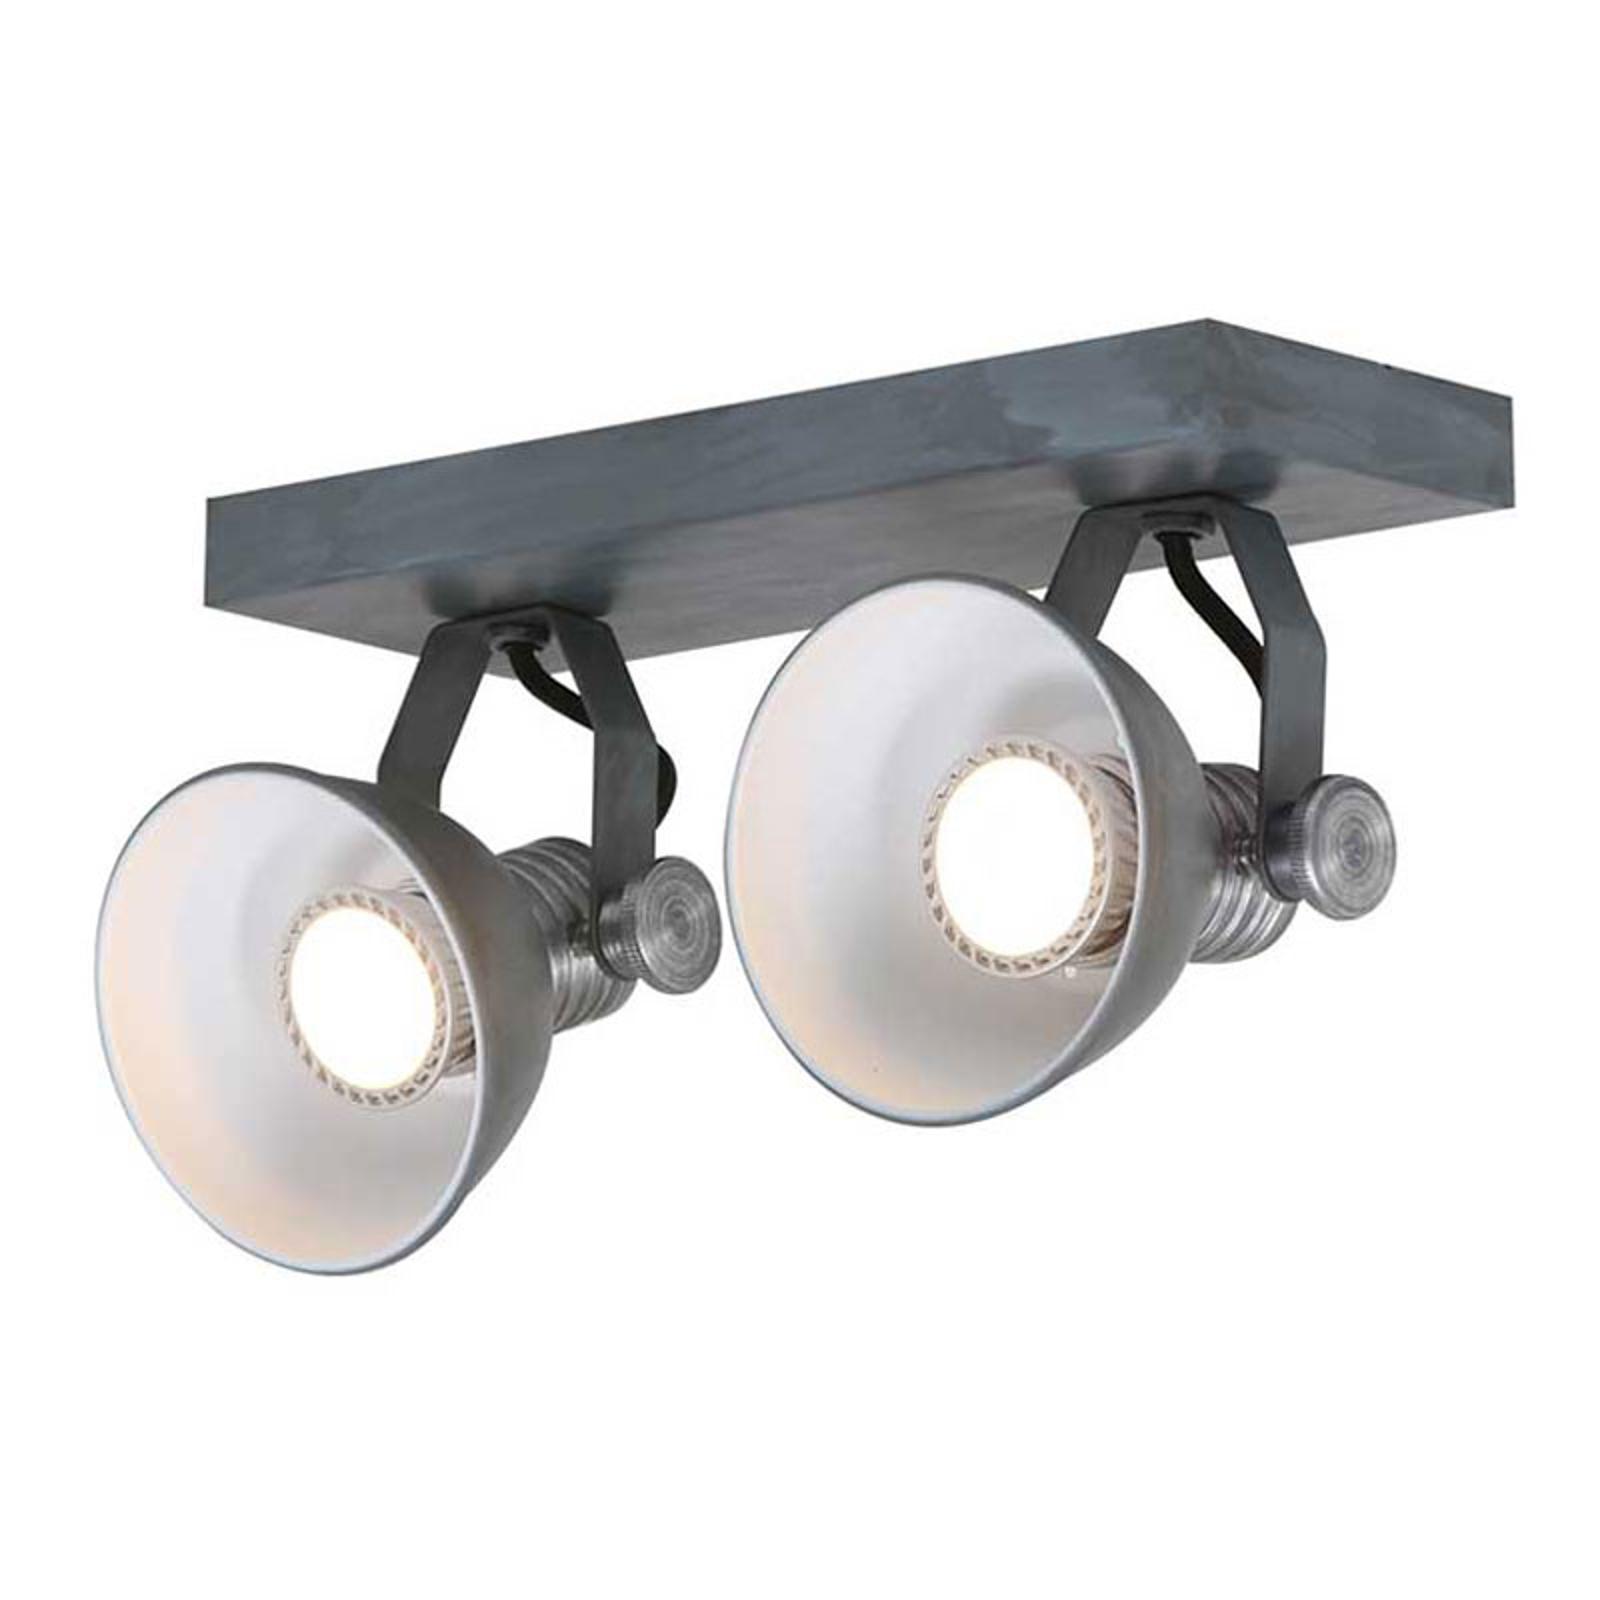 Spot LED soffitto Brooklyn 2 luci, grigio